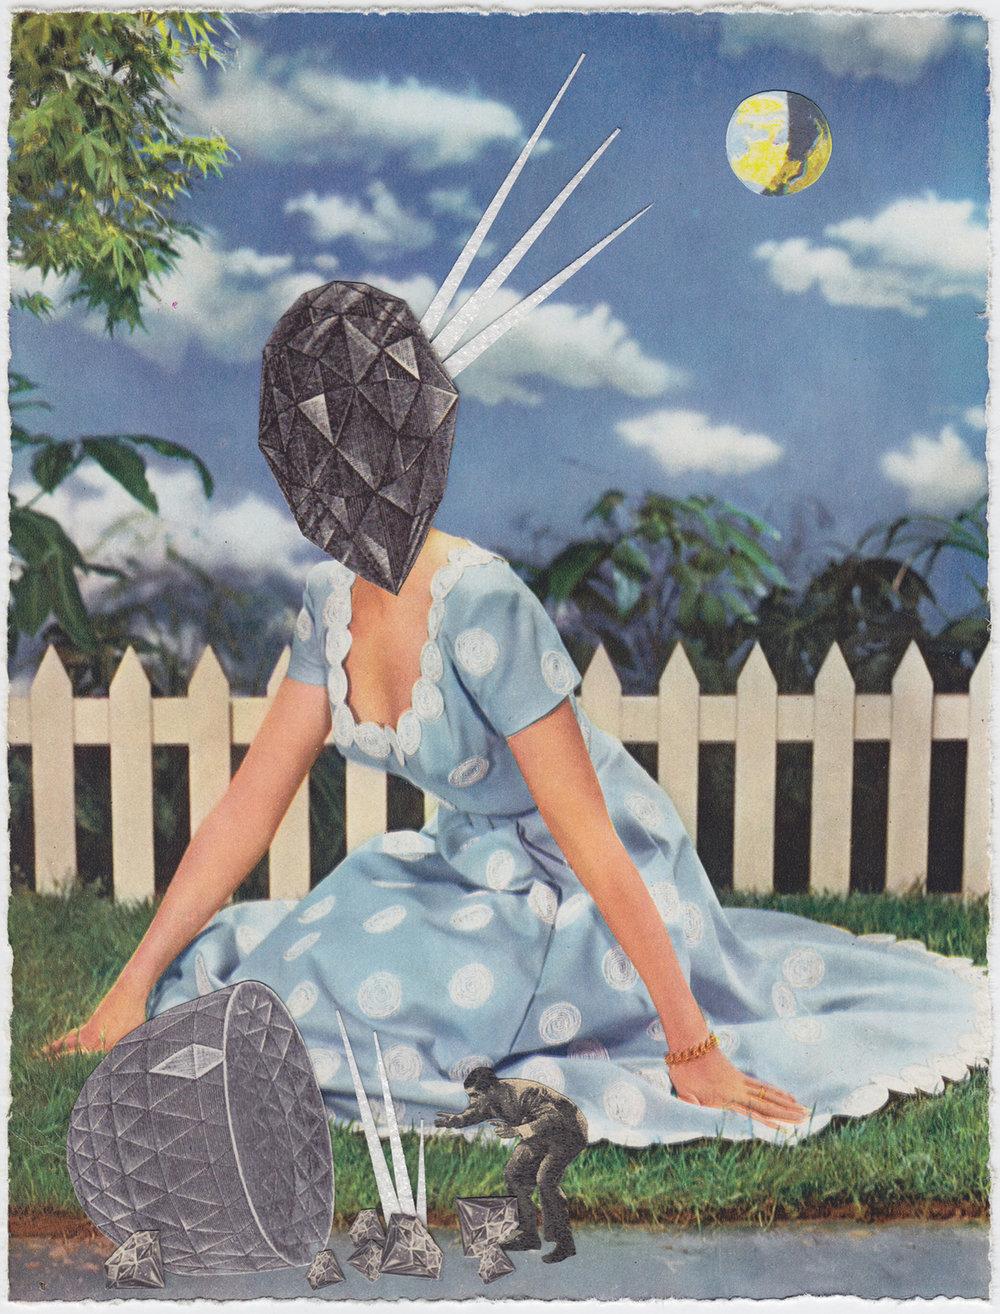 Picket Fence Dreamer